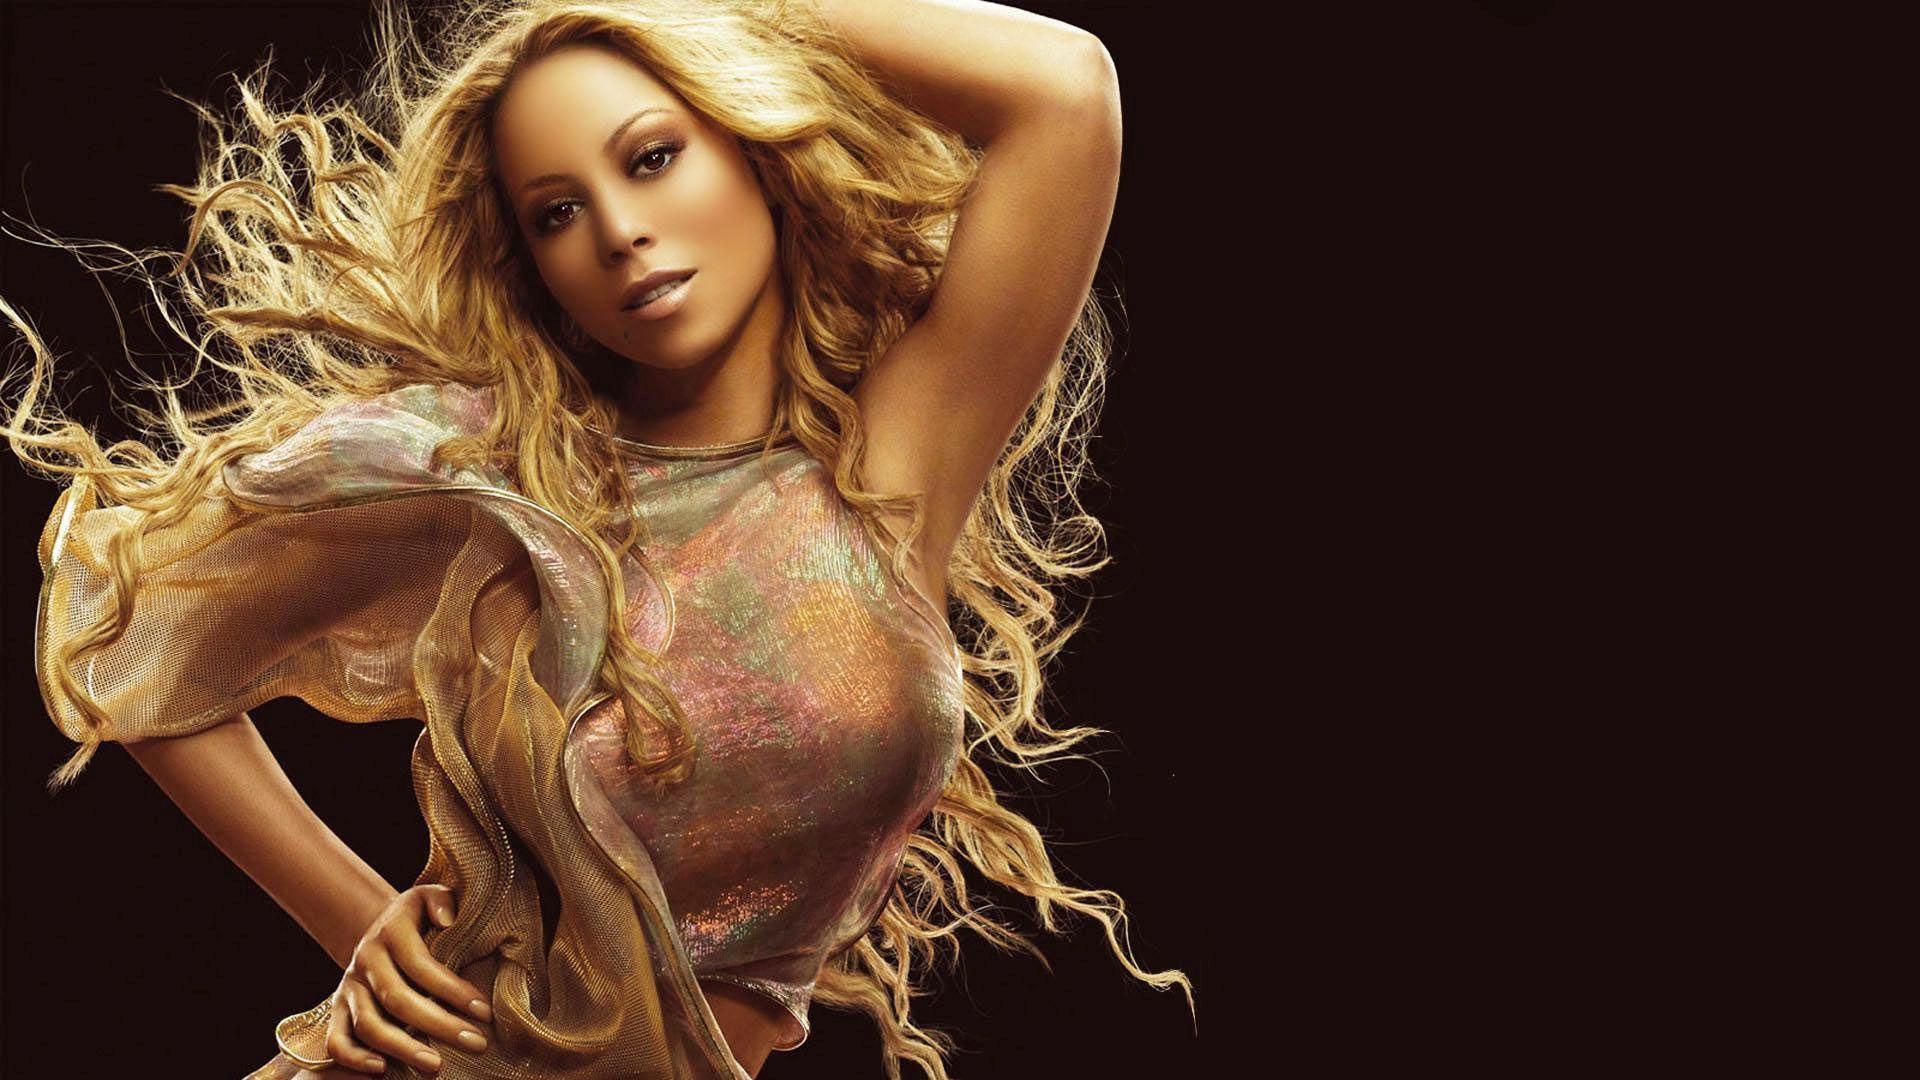 Mariah Carey High Quality Wallpapers